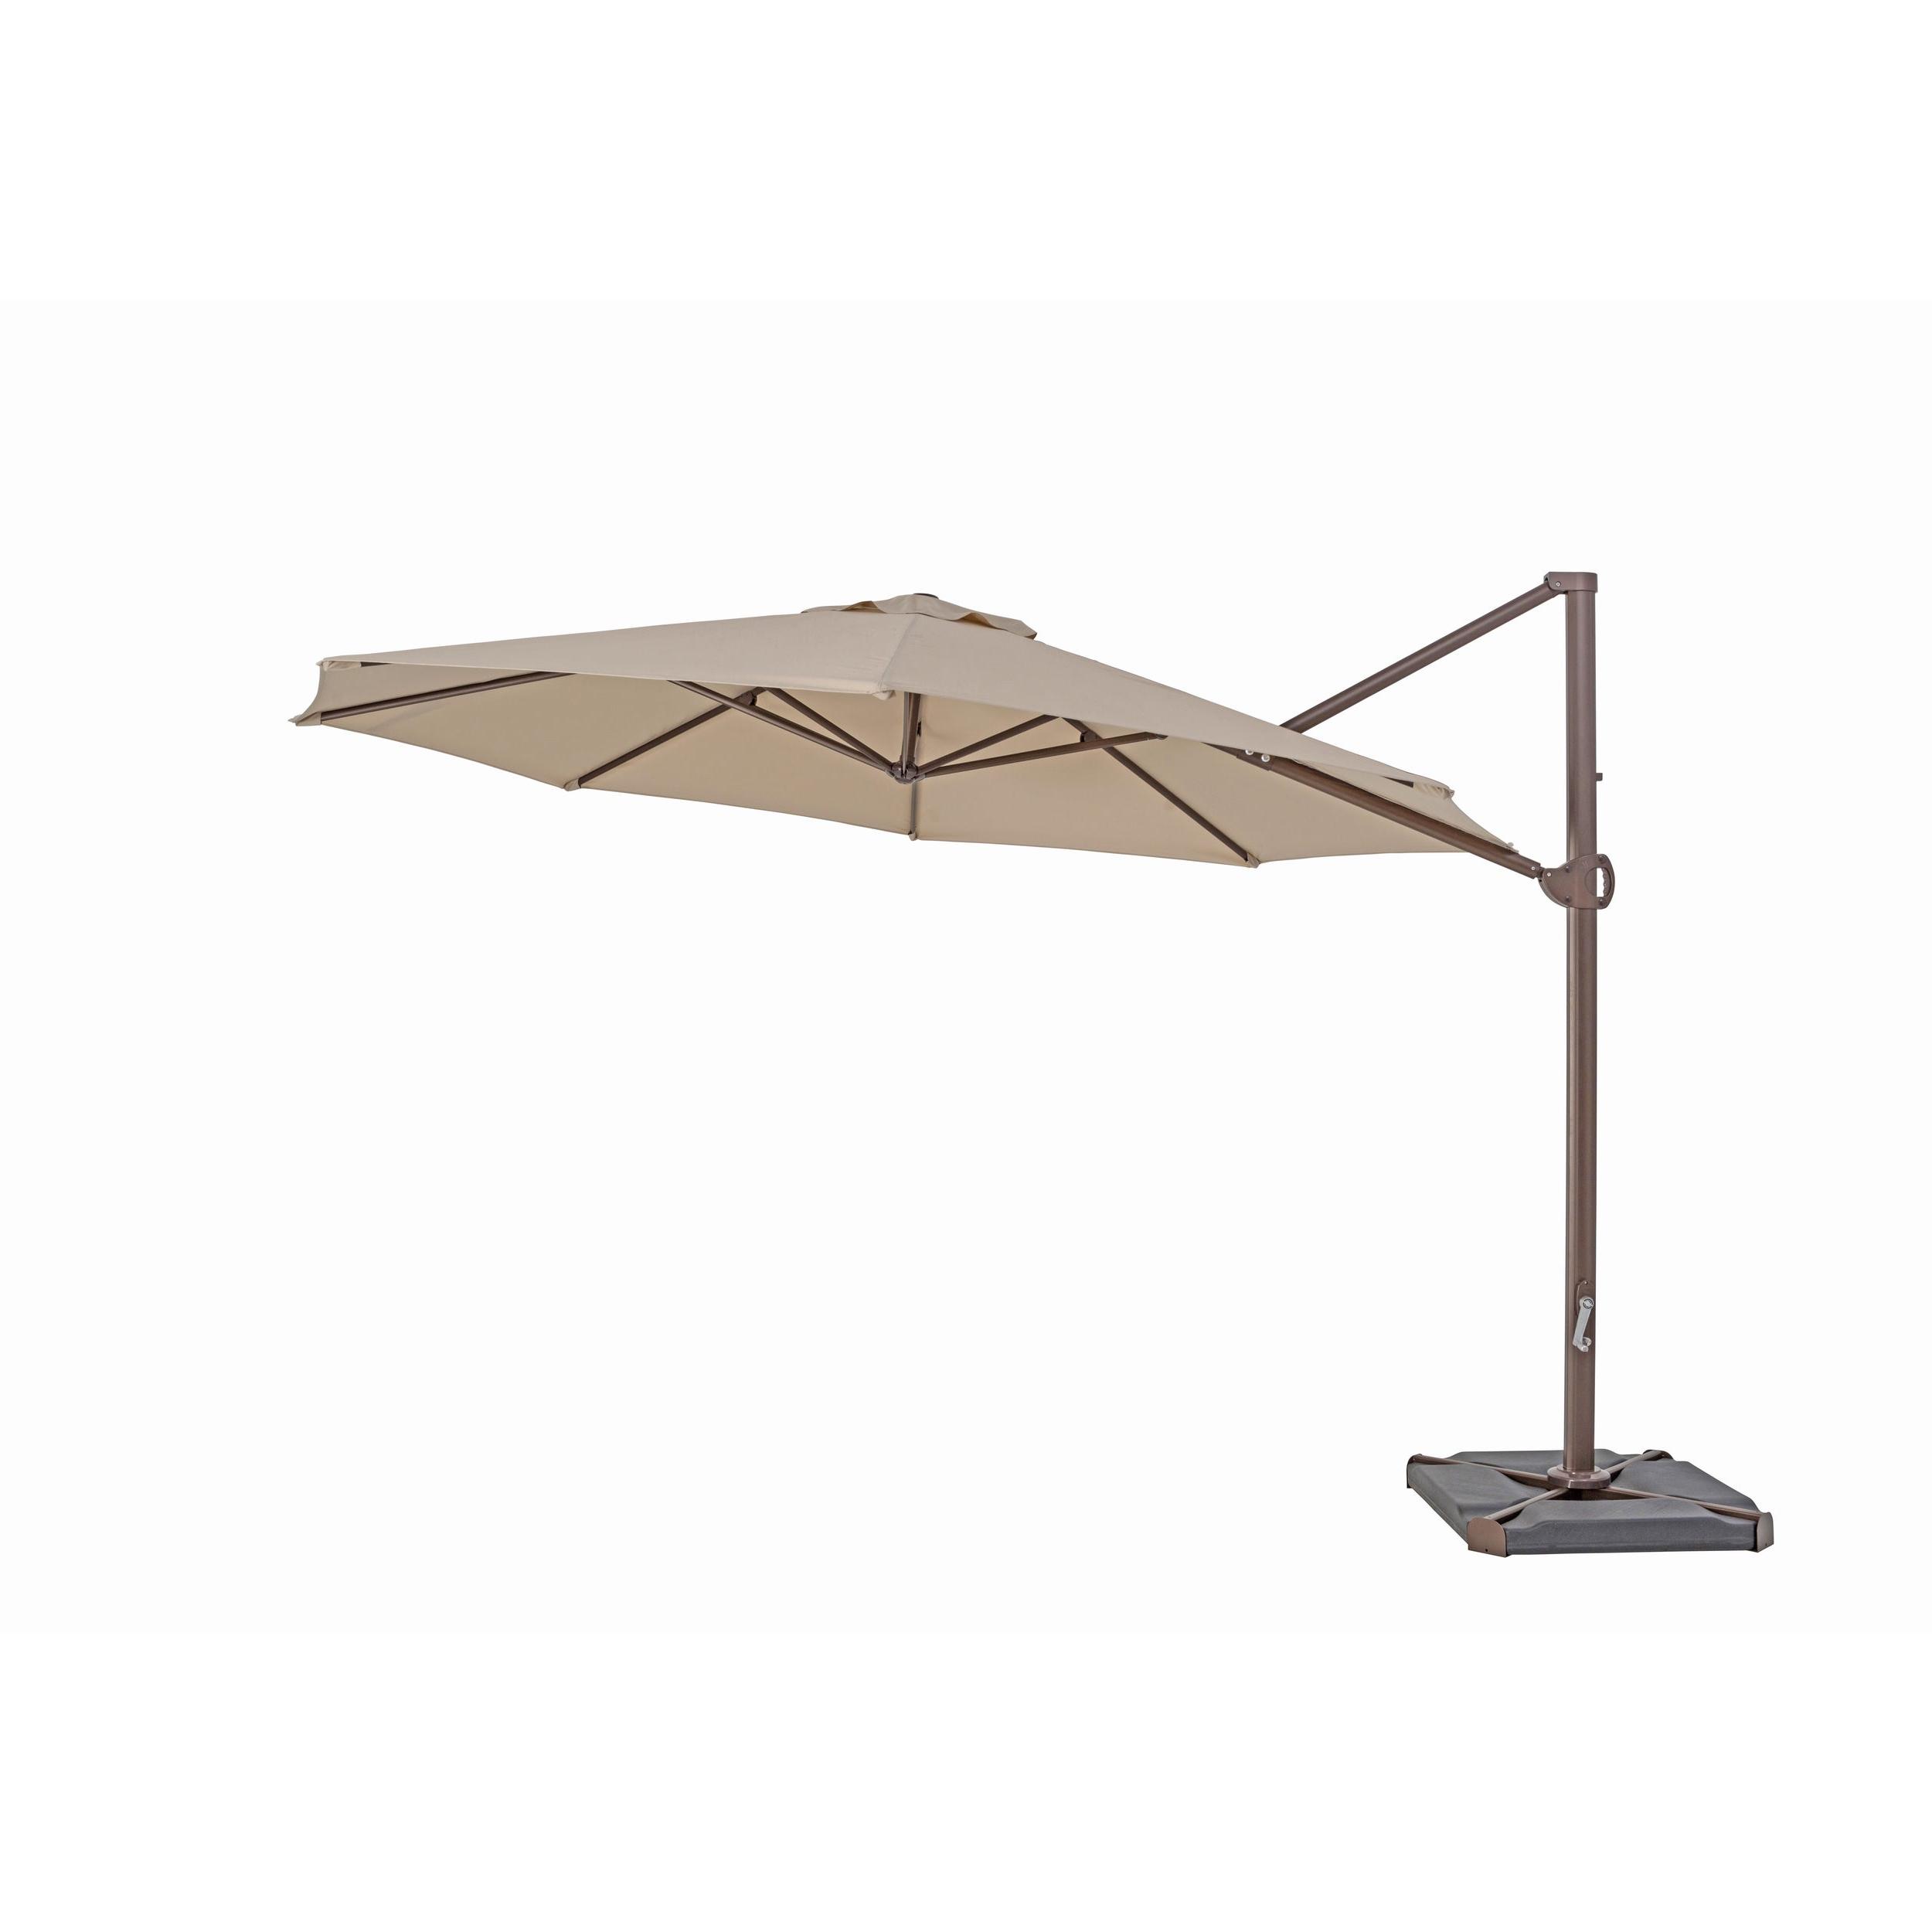 Krystal Square Cantilever Sunbrella Umbrellas For 2019 Trueshade Plus 11.5 Foot Cantilever Umbrella (Gallery 8 of 20)